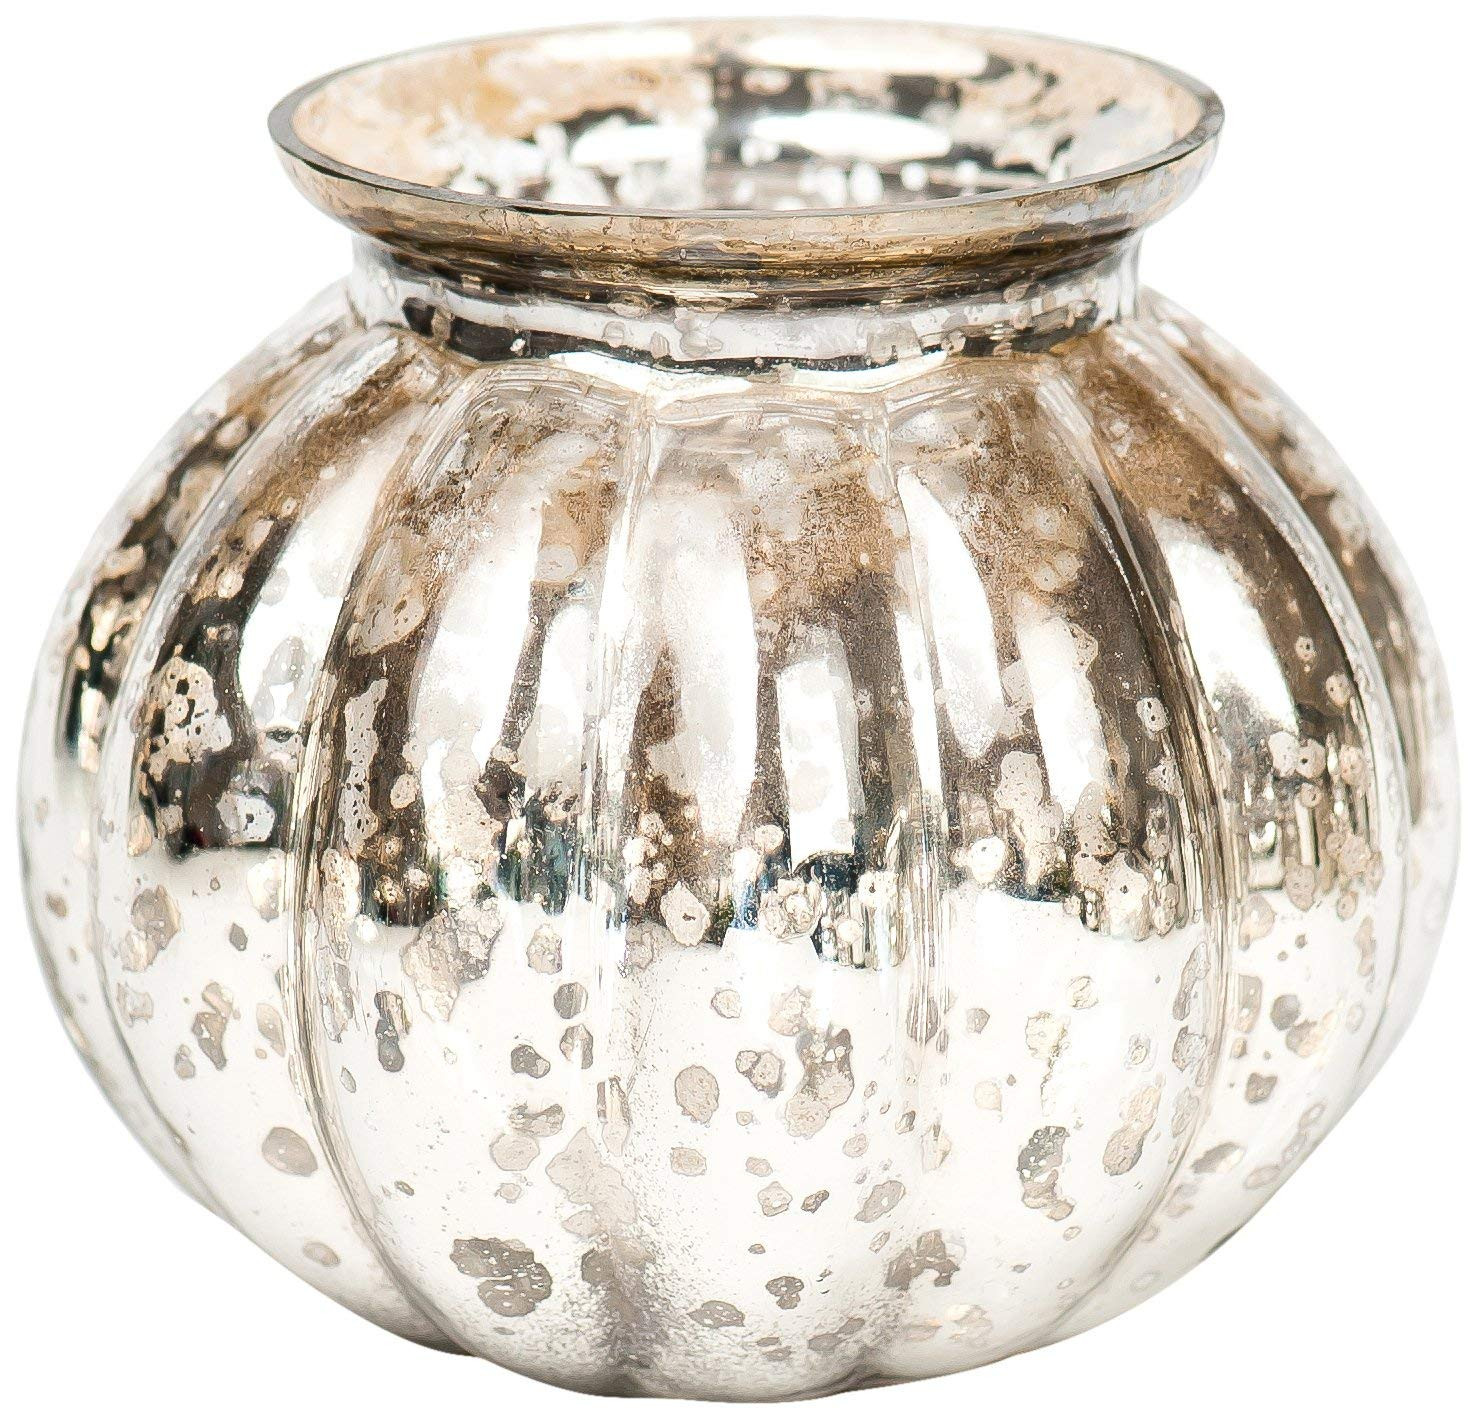 antique orange glass vase of insideretail mercury glass mini round vase silver 13 cm set of 3 pertaining to insideretail mercury glass mini round vase silver 13 cm set of 3 amazon co uk kitchen home